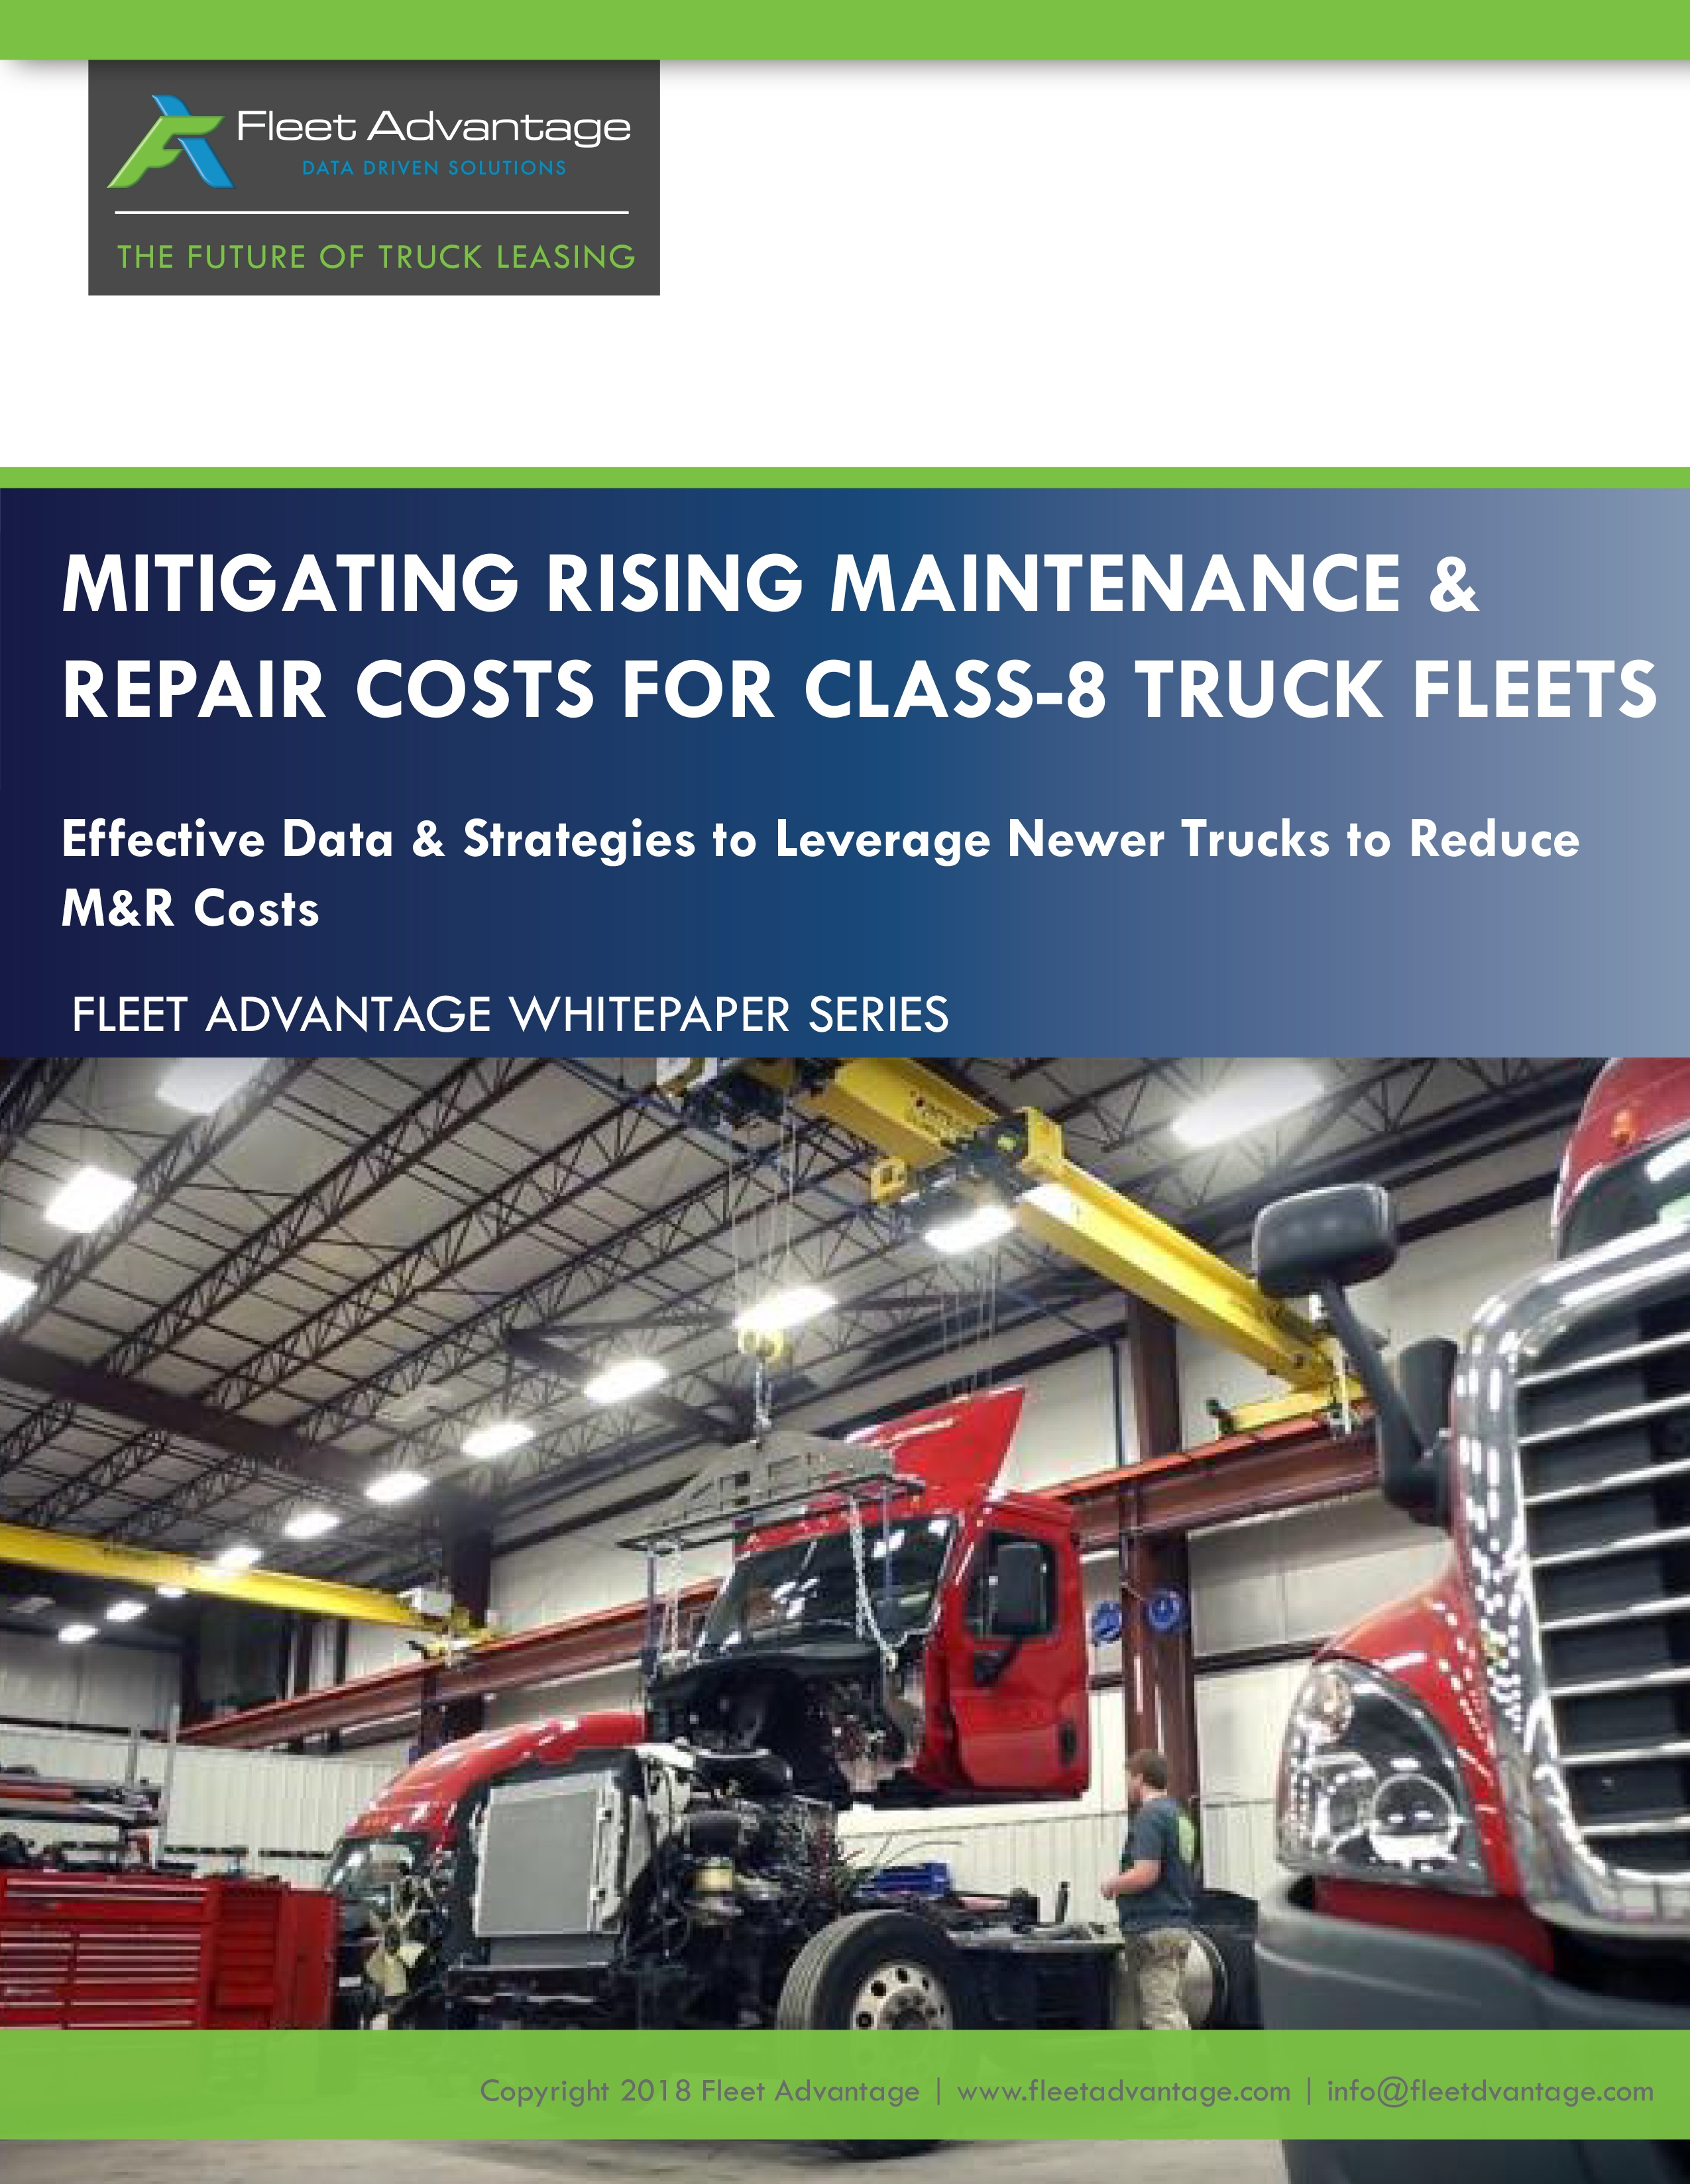 Mitigating Rising M&R Costs - Effective Data & Strategies.jpg